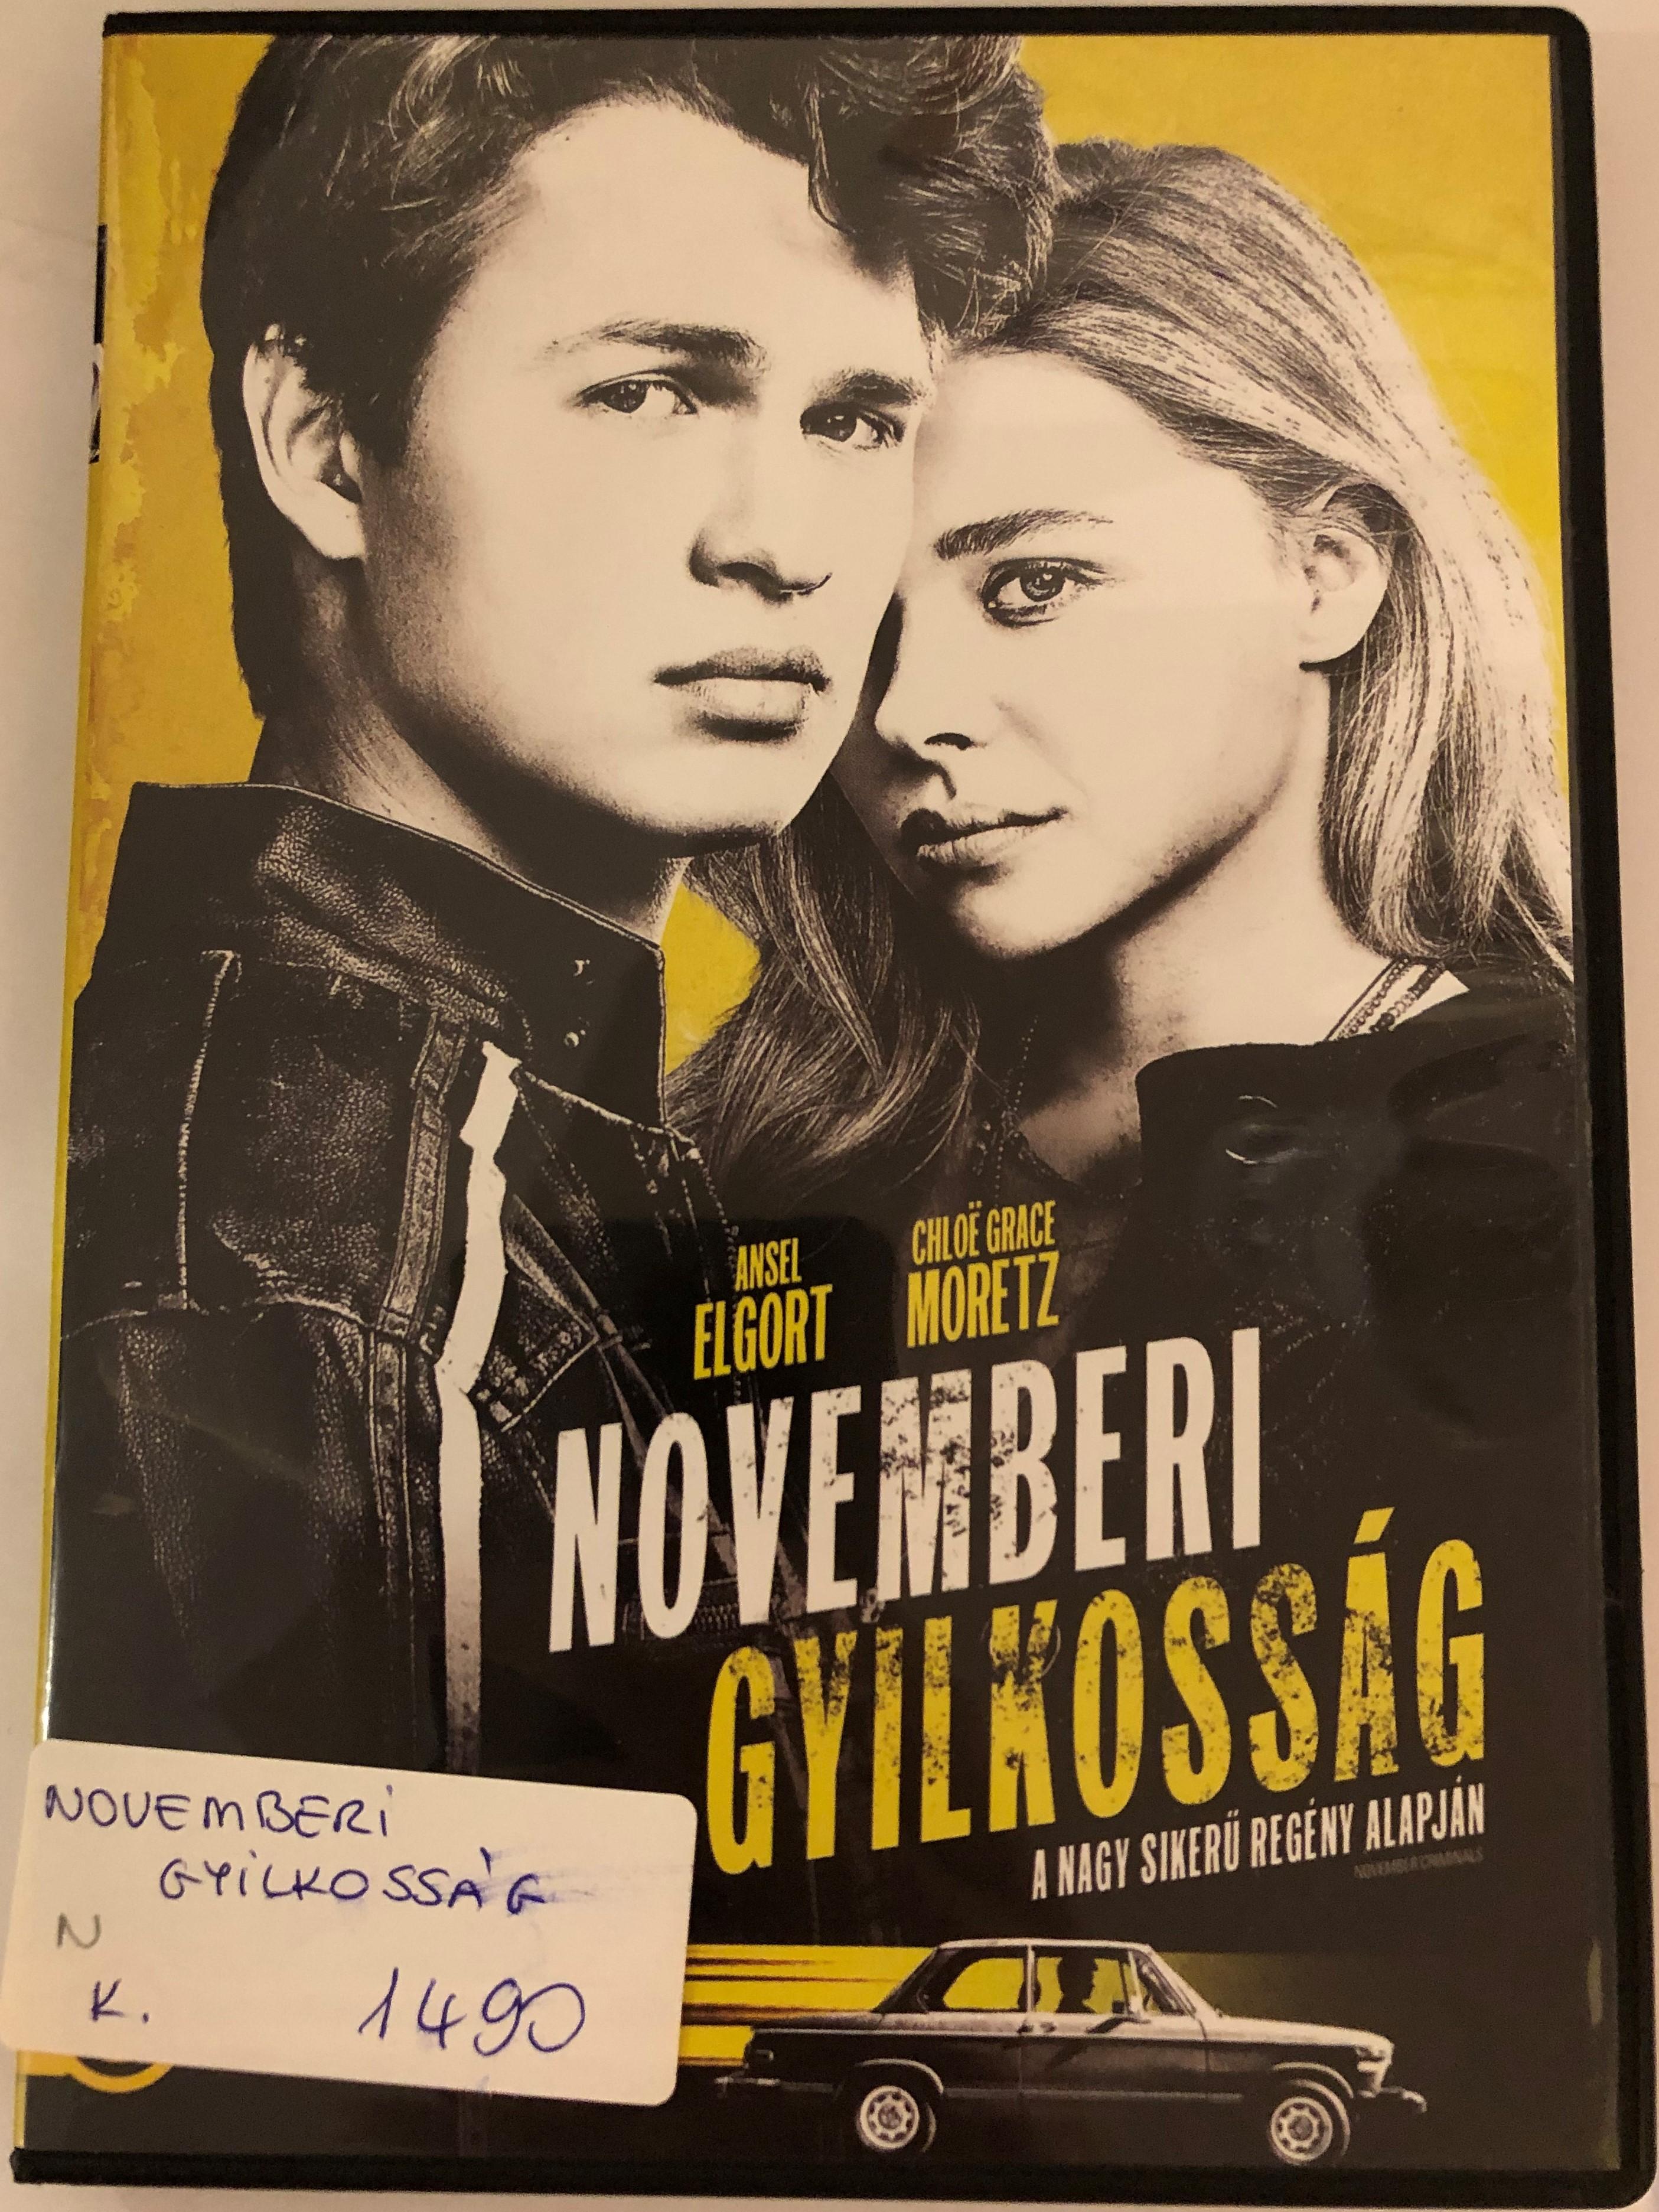 november-criminals-dvd-2017-novemberi-gyilkoss-gok-directed-by-sacha-gervasi-1.jpg